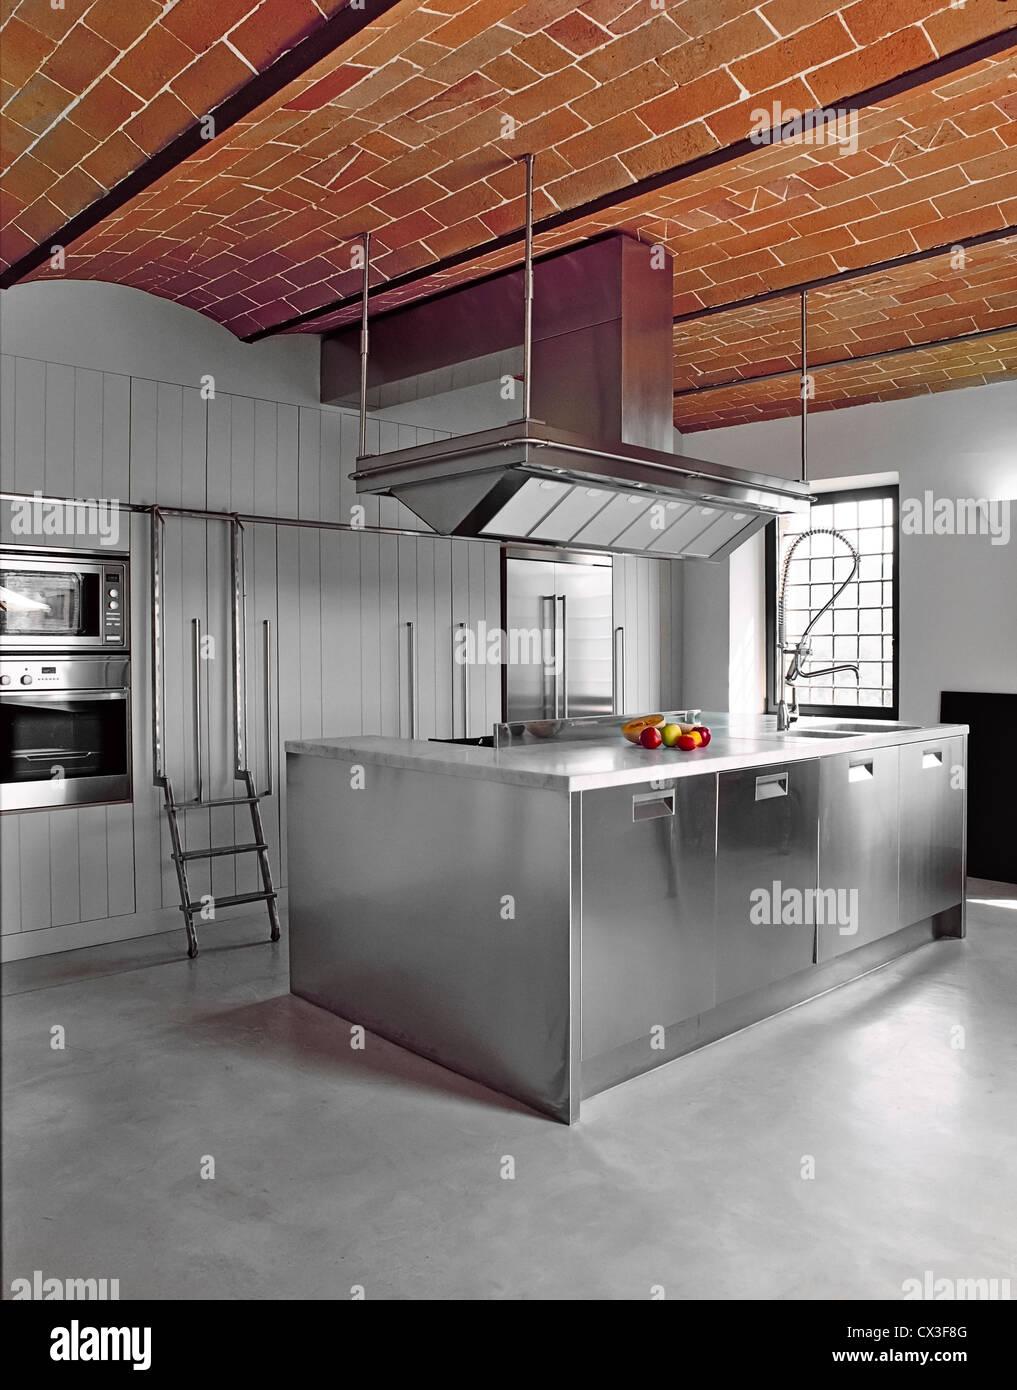 stock photo modern kitchen with concrete floor and bricks vaults concrete floor kitchen Stock Photo modern kitchen with concrete floor and bricks vaults